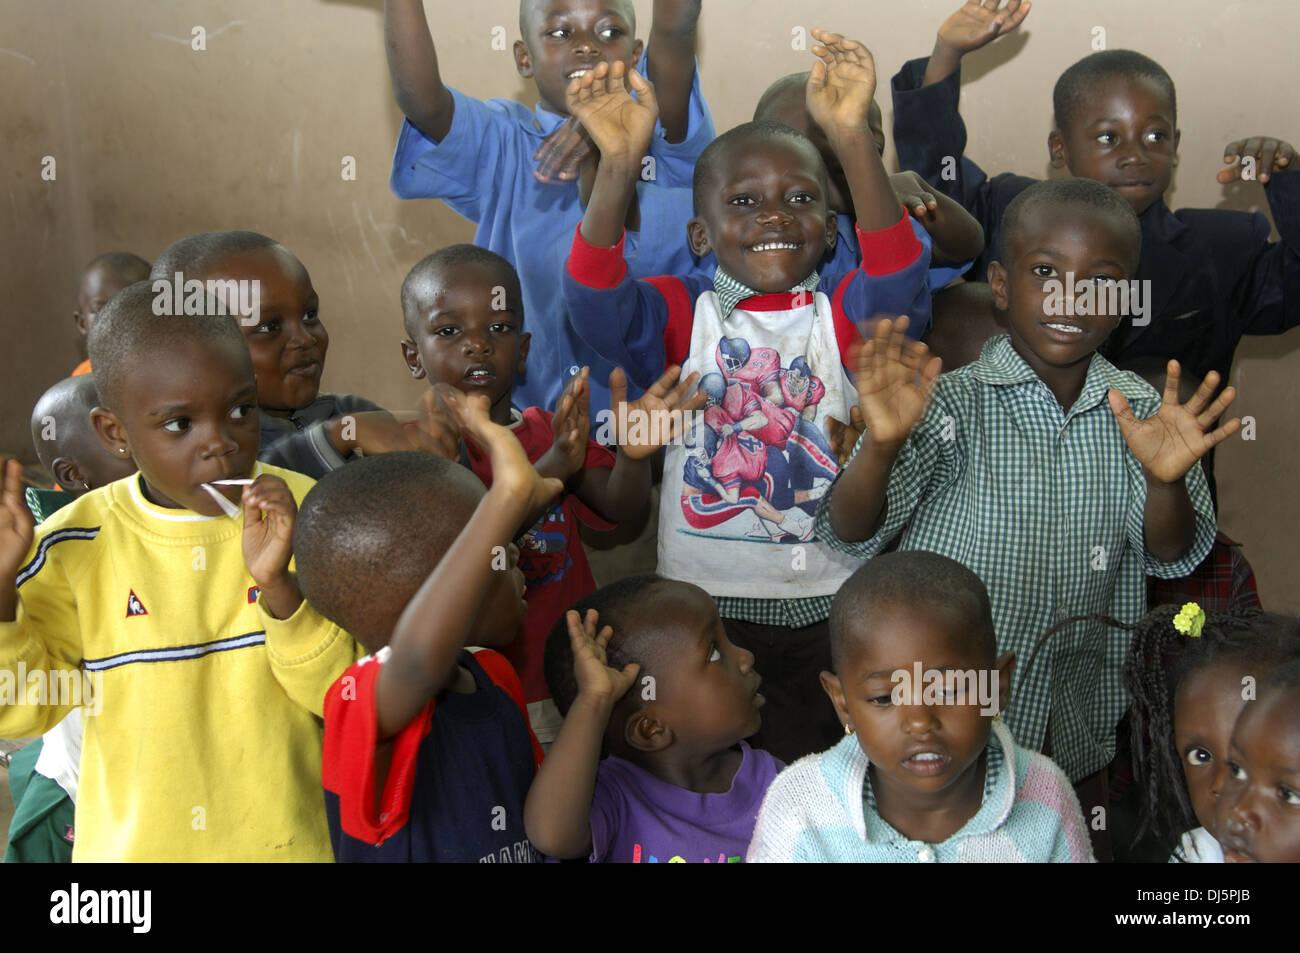 Rackety pre-school children, Ghana - Stock Image